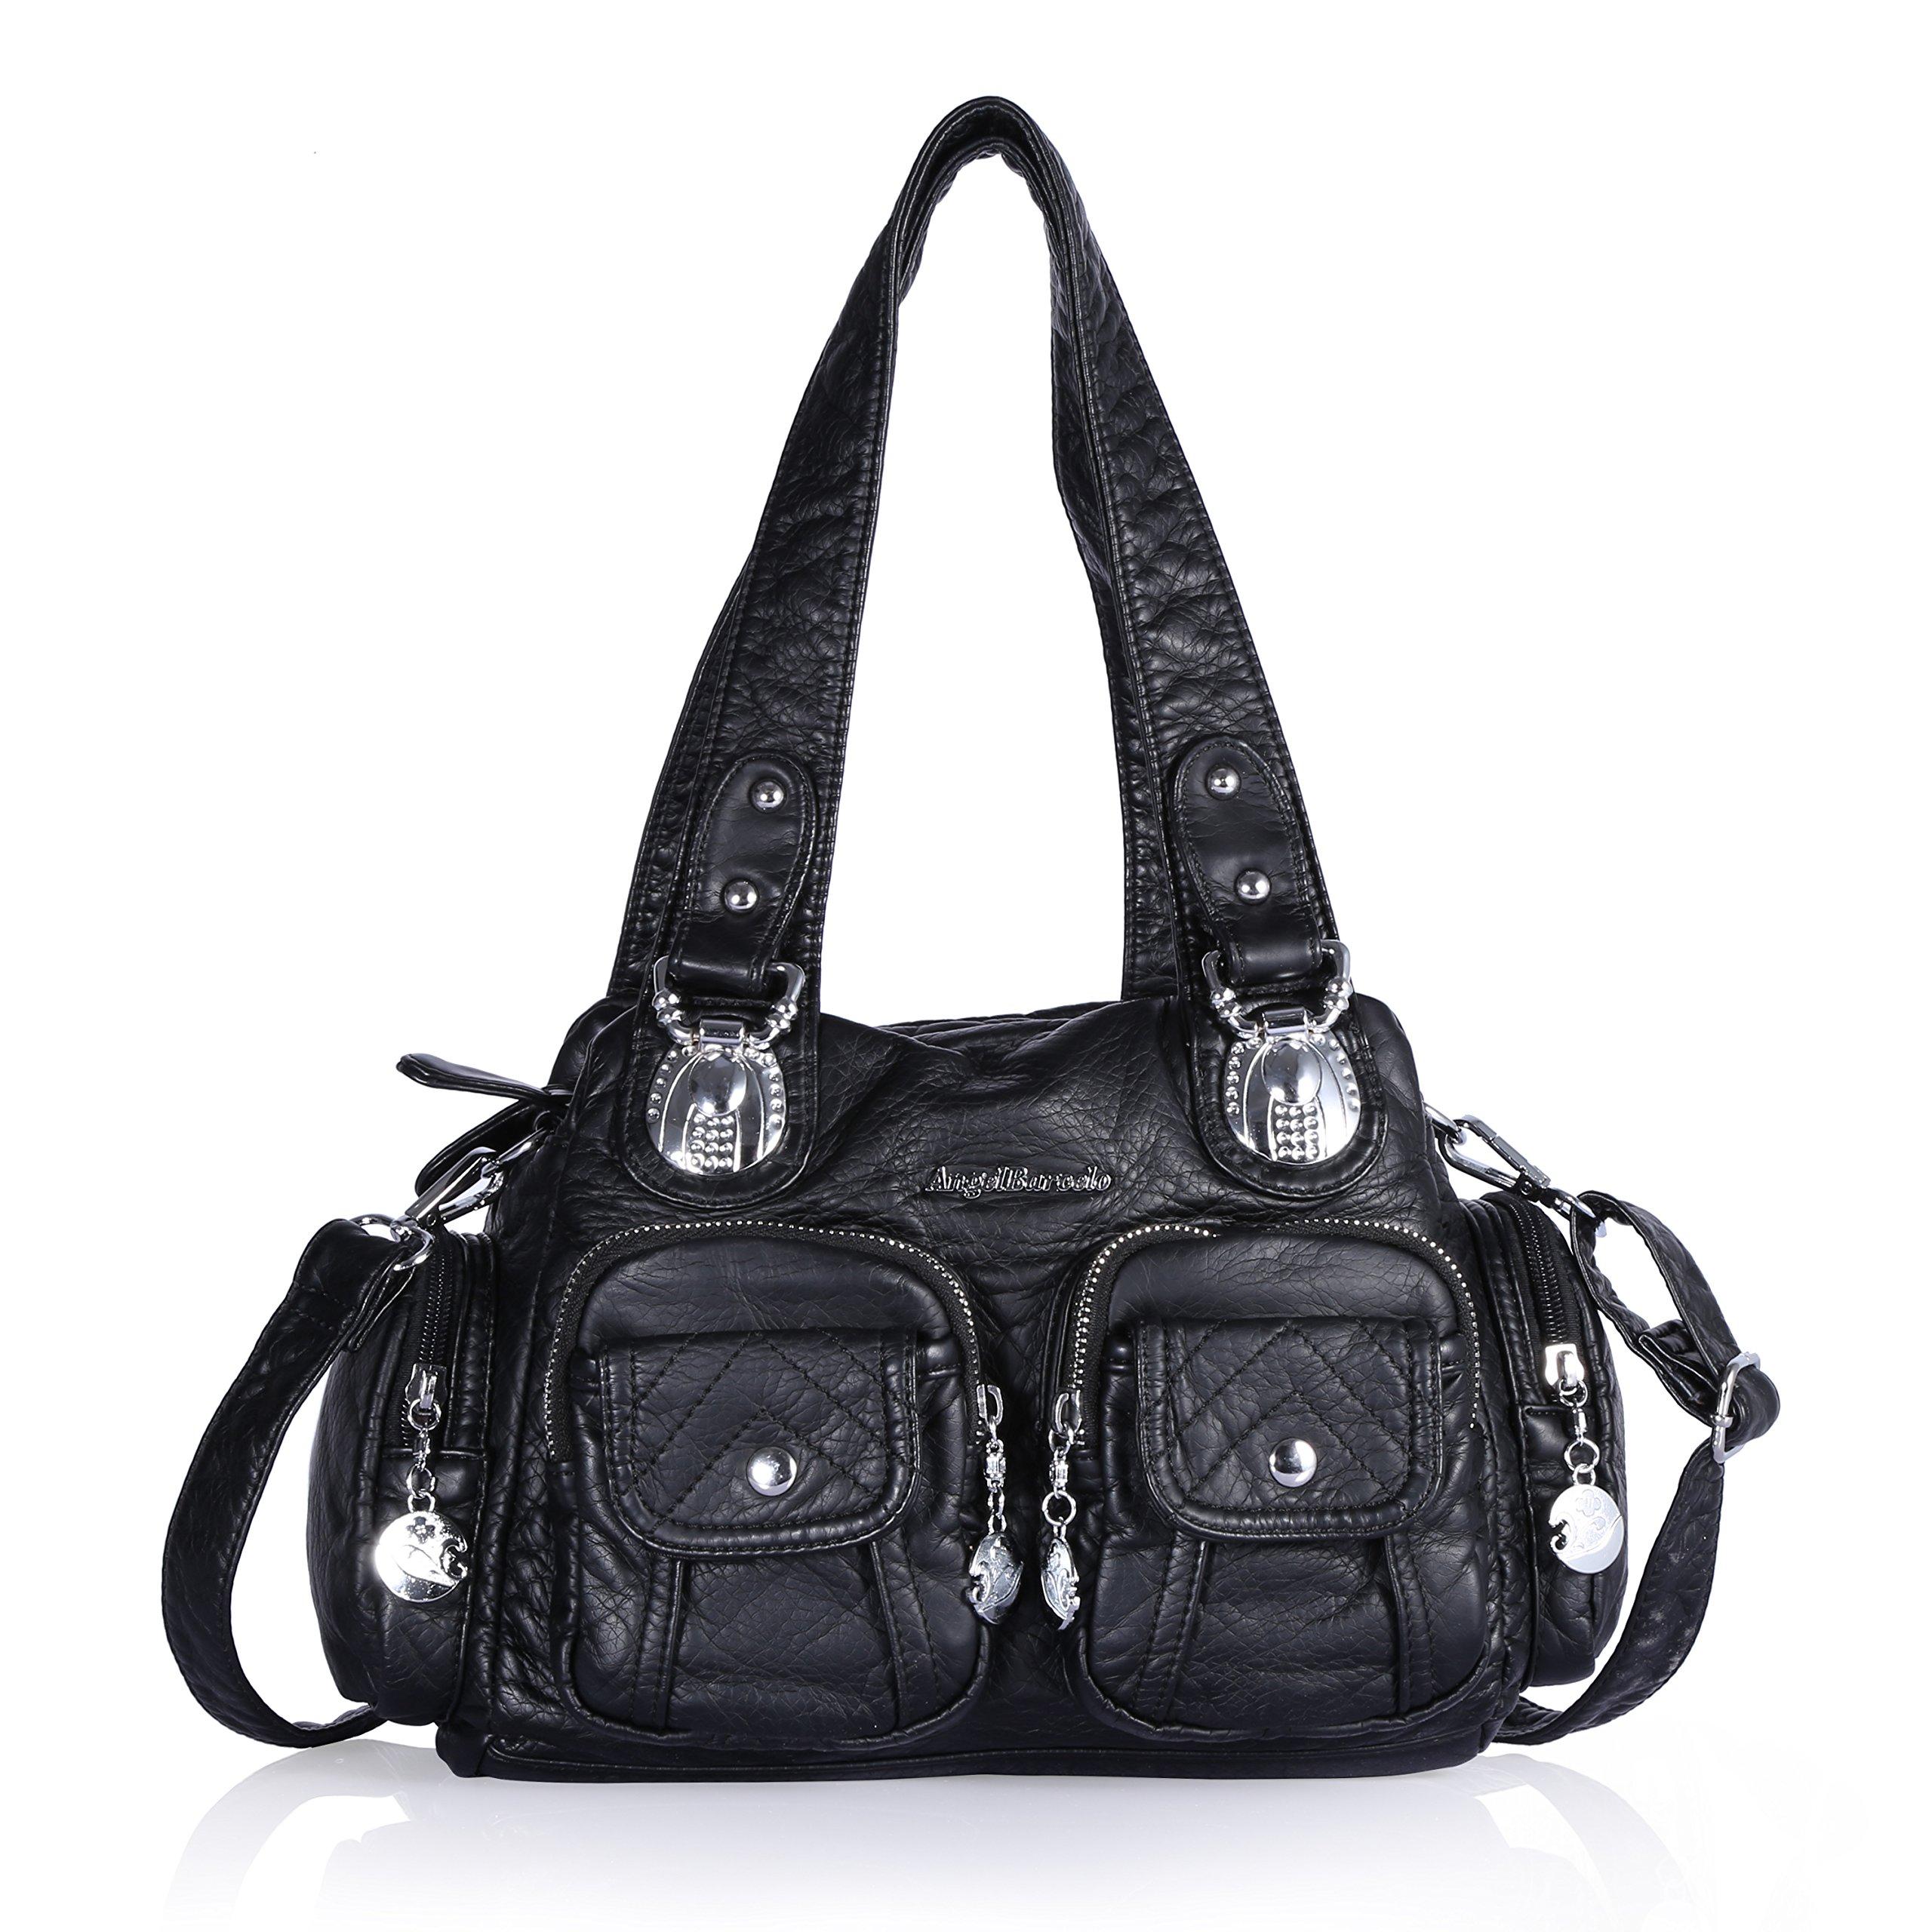 Angel Barcelo 3 Mini Handbags Women Purse PU Leather Top Zippers Multi Pockets Shoulder Bags … (Black)